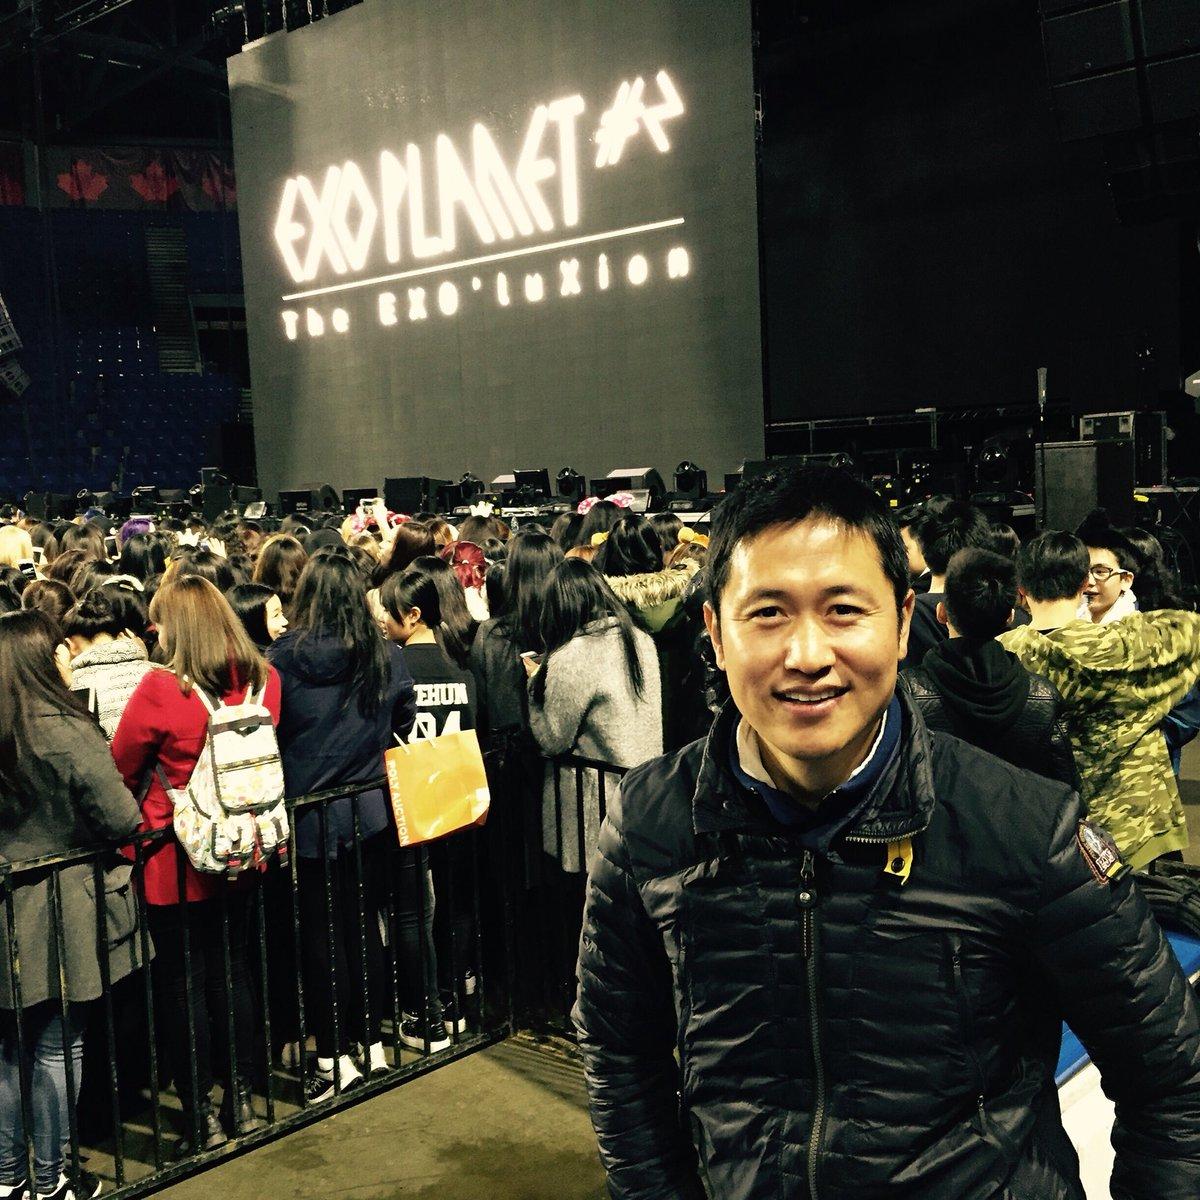 EXO in Vancouver..! https://t.co/p5WmpgkdgR